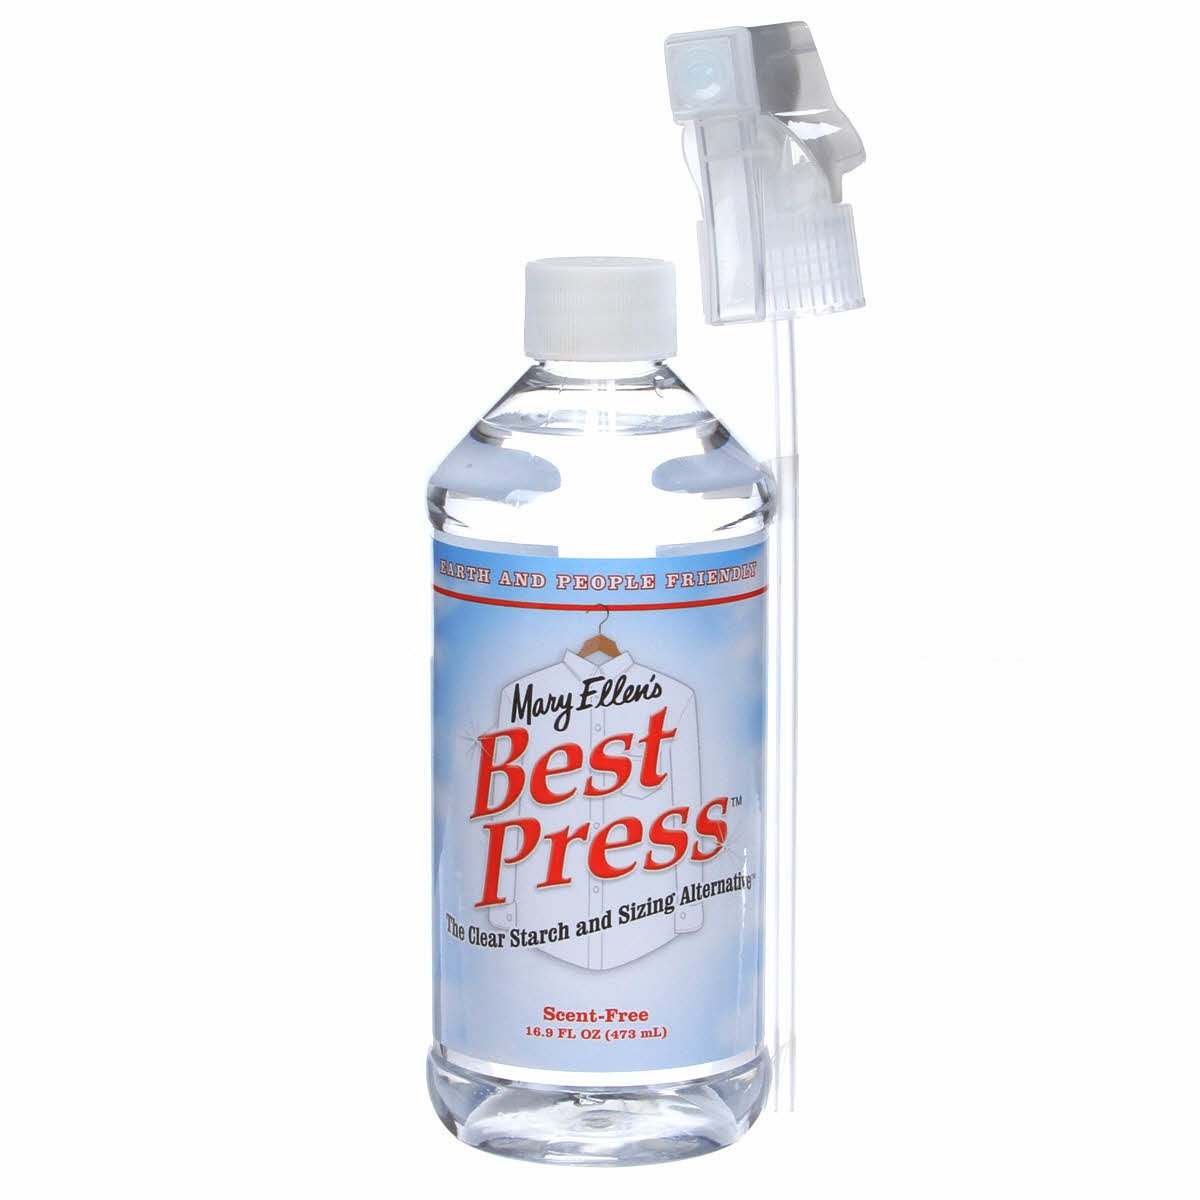 Mary Ellen's Best Press-Scent Free